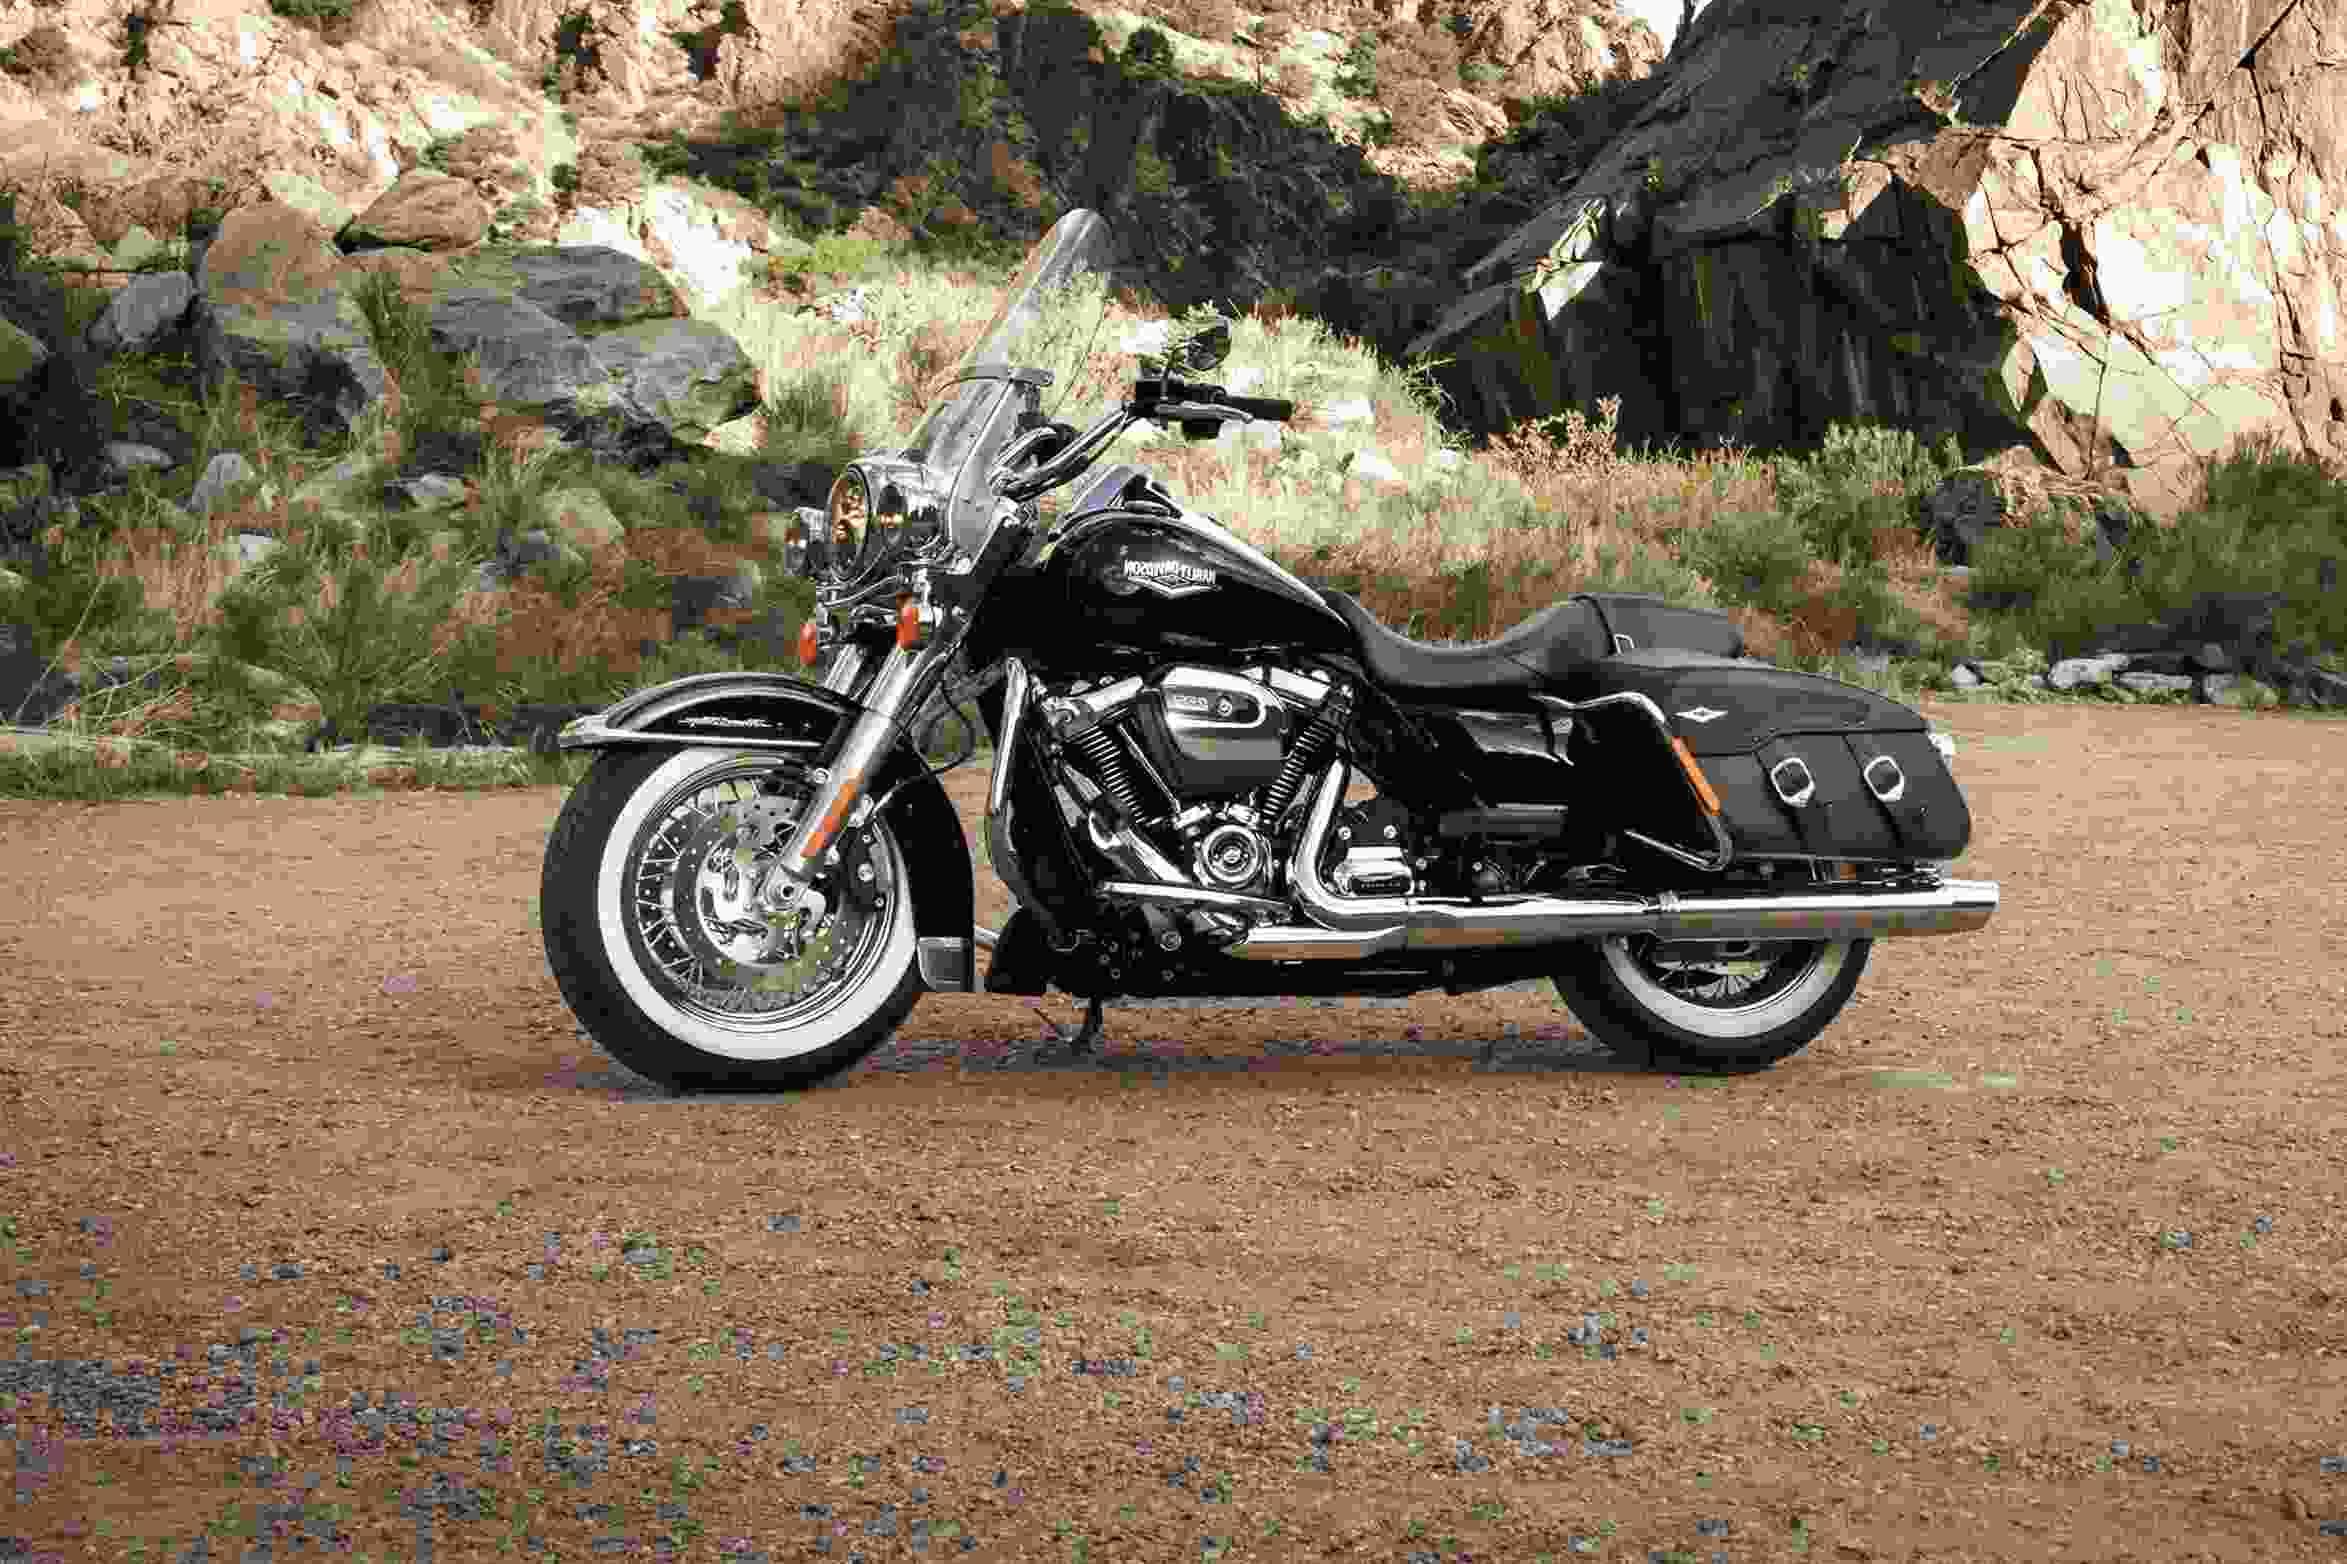 Harley Davidson Road King Classic Comprar Usado No Brasil 43 Harley Davidson Road King Classic Em Segunda Mao